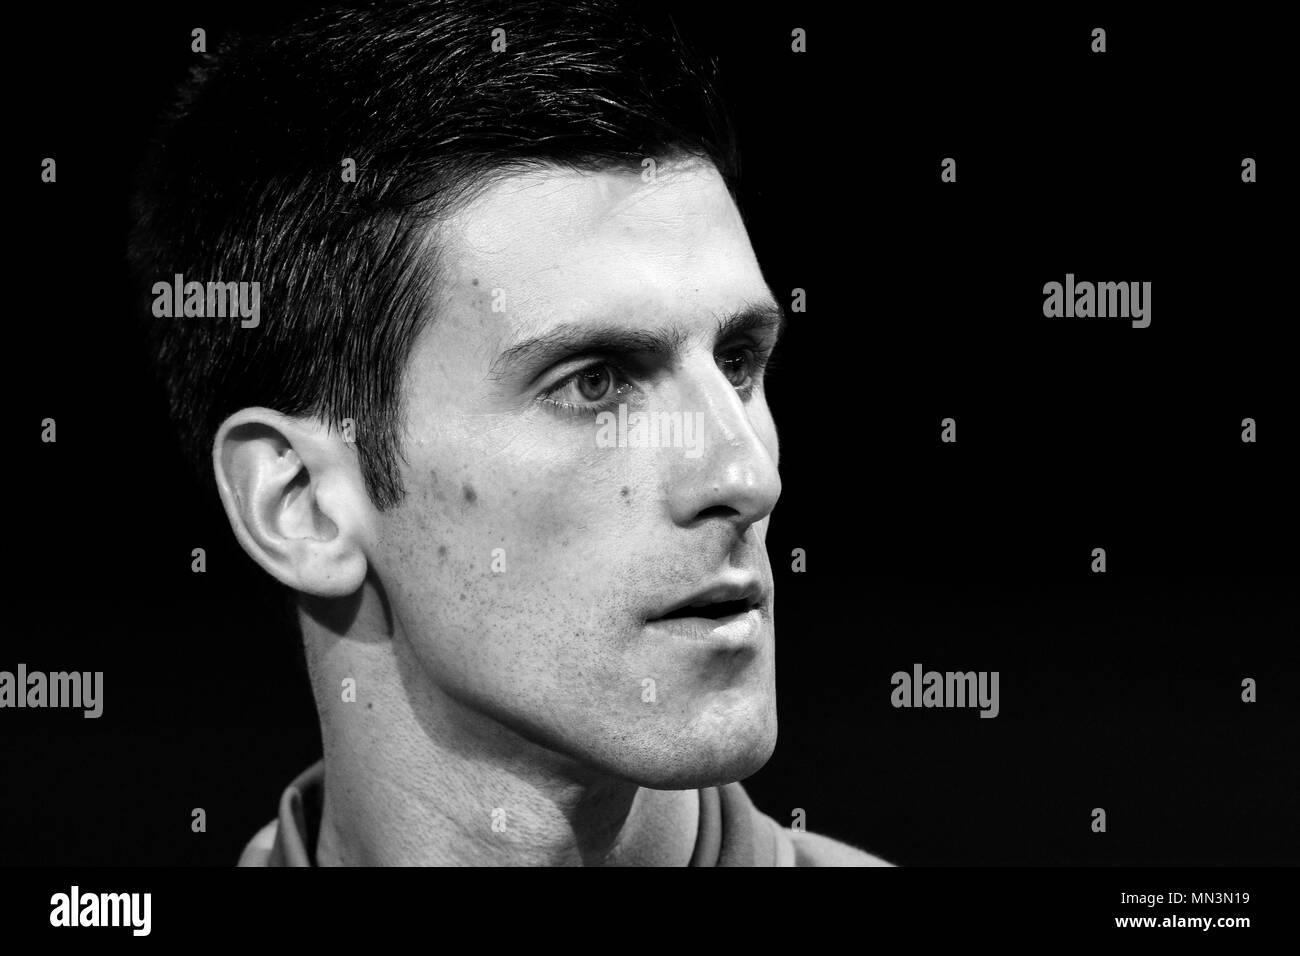 Roger Federer vs Novak Djokovic during the Singles Final of the 2015 Barclays ATP World Tour Finals - O2 Arena London England. 22 November 2015 - Stock Image